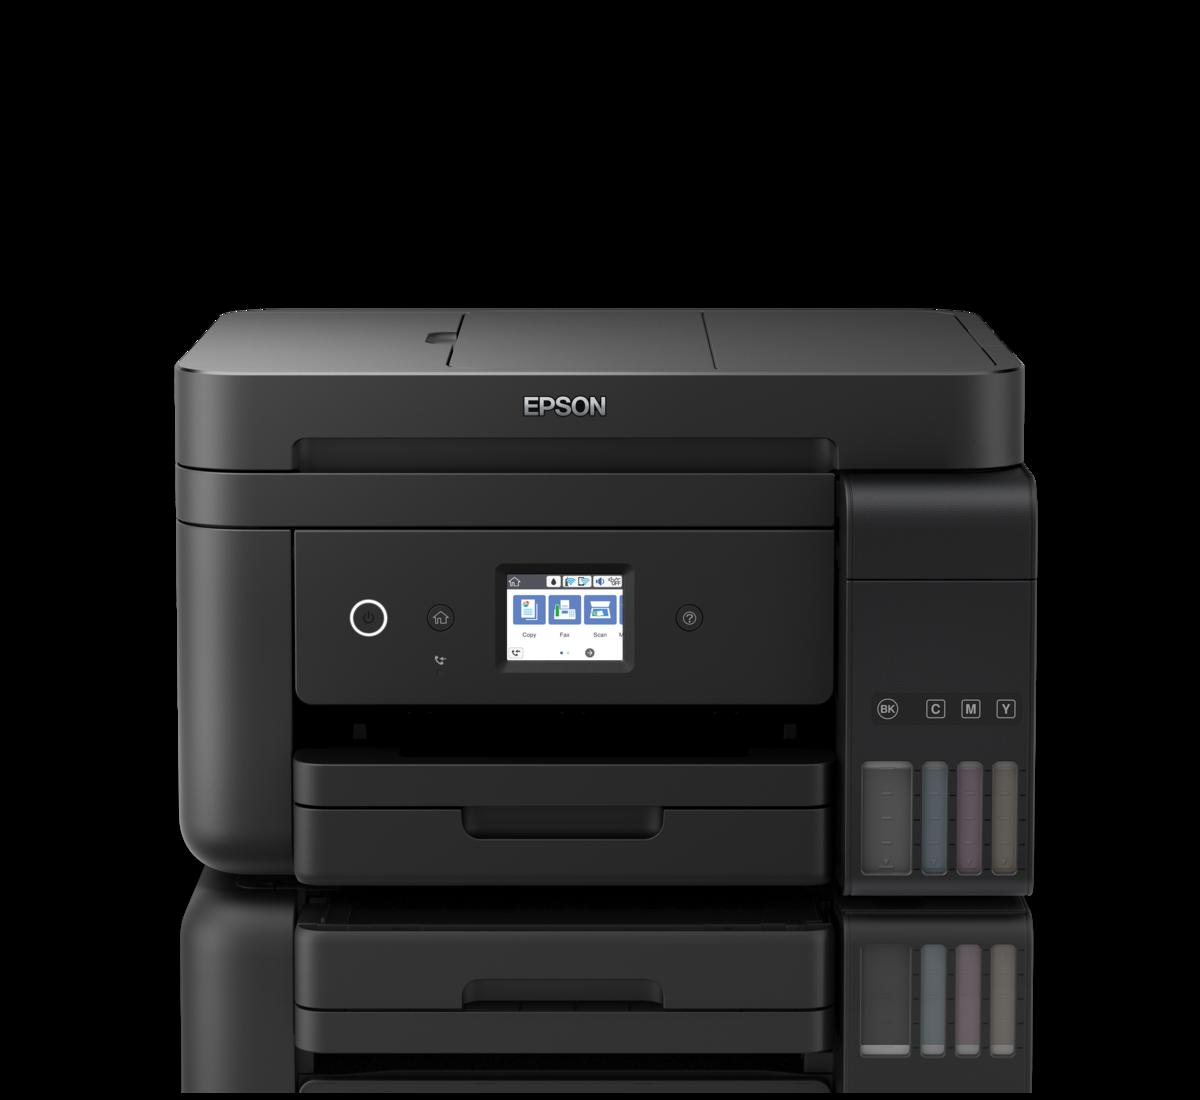 Epson L-6190 Multifunction Color Printer